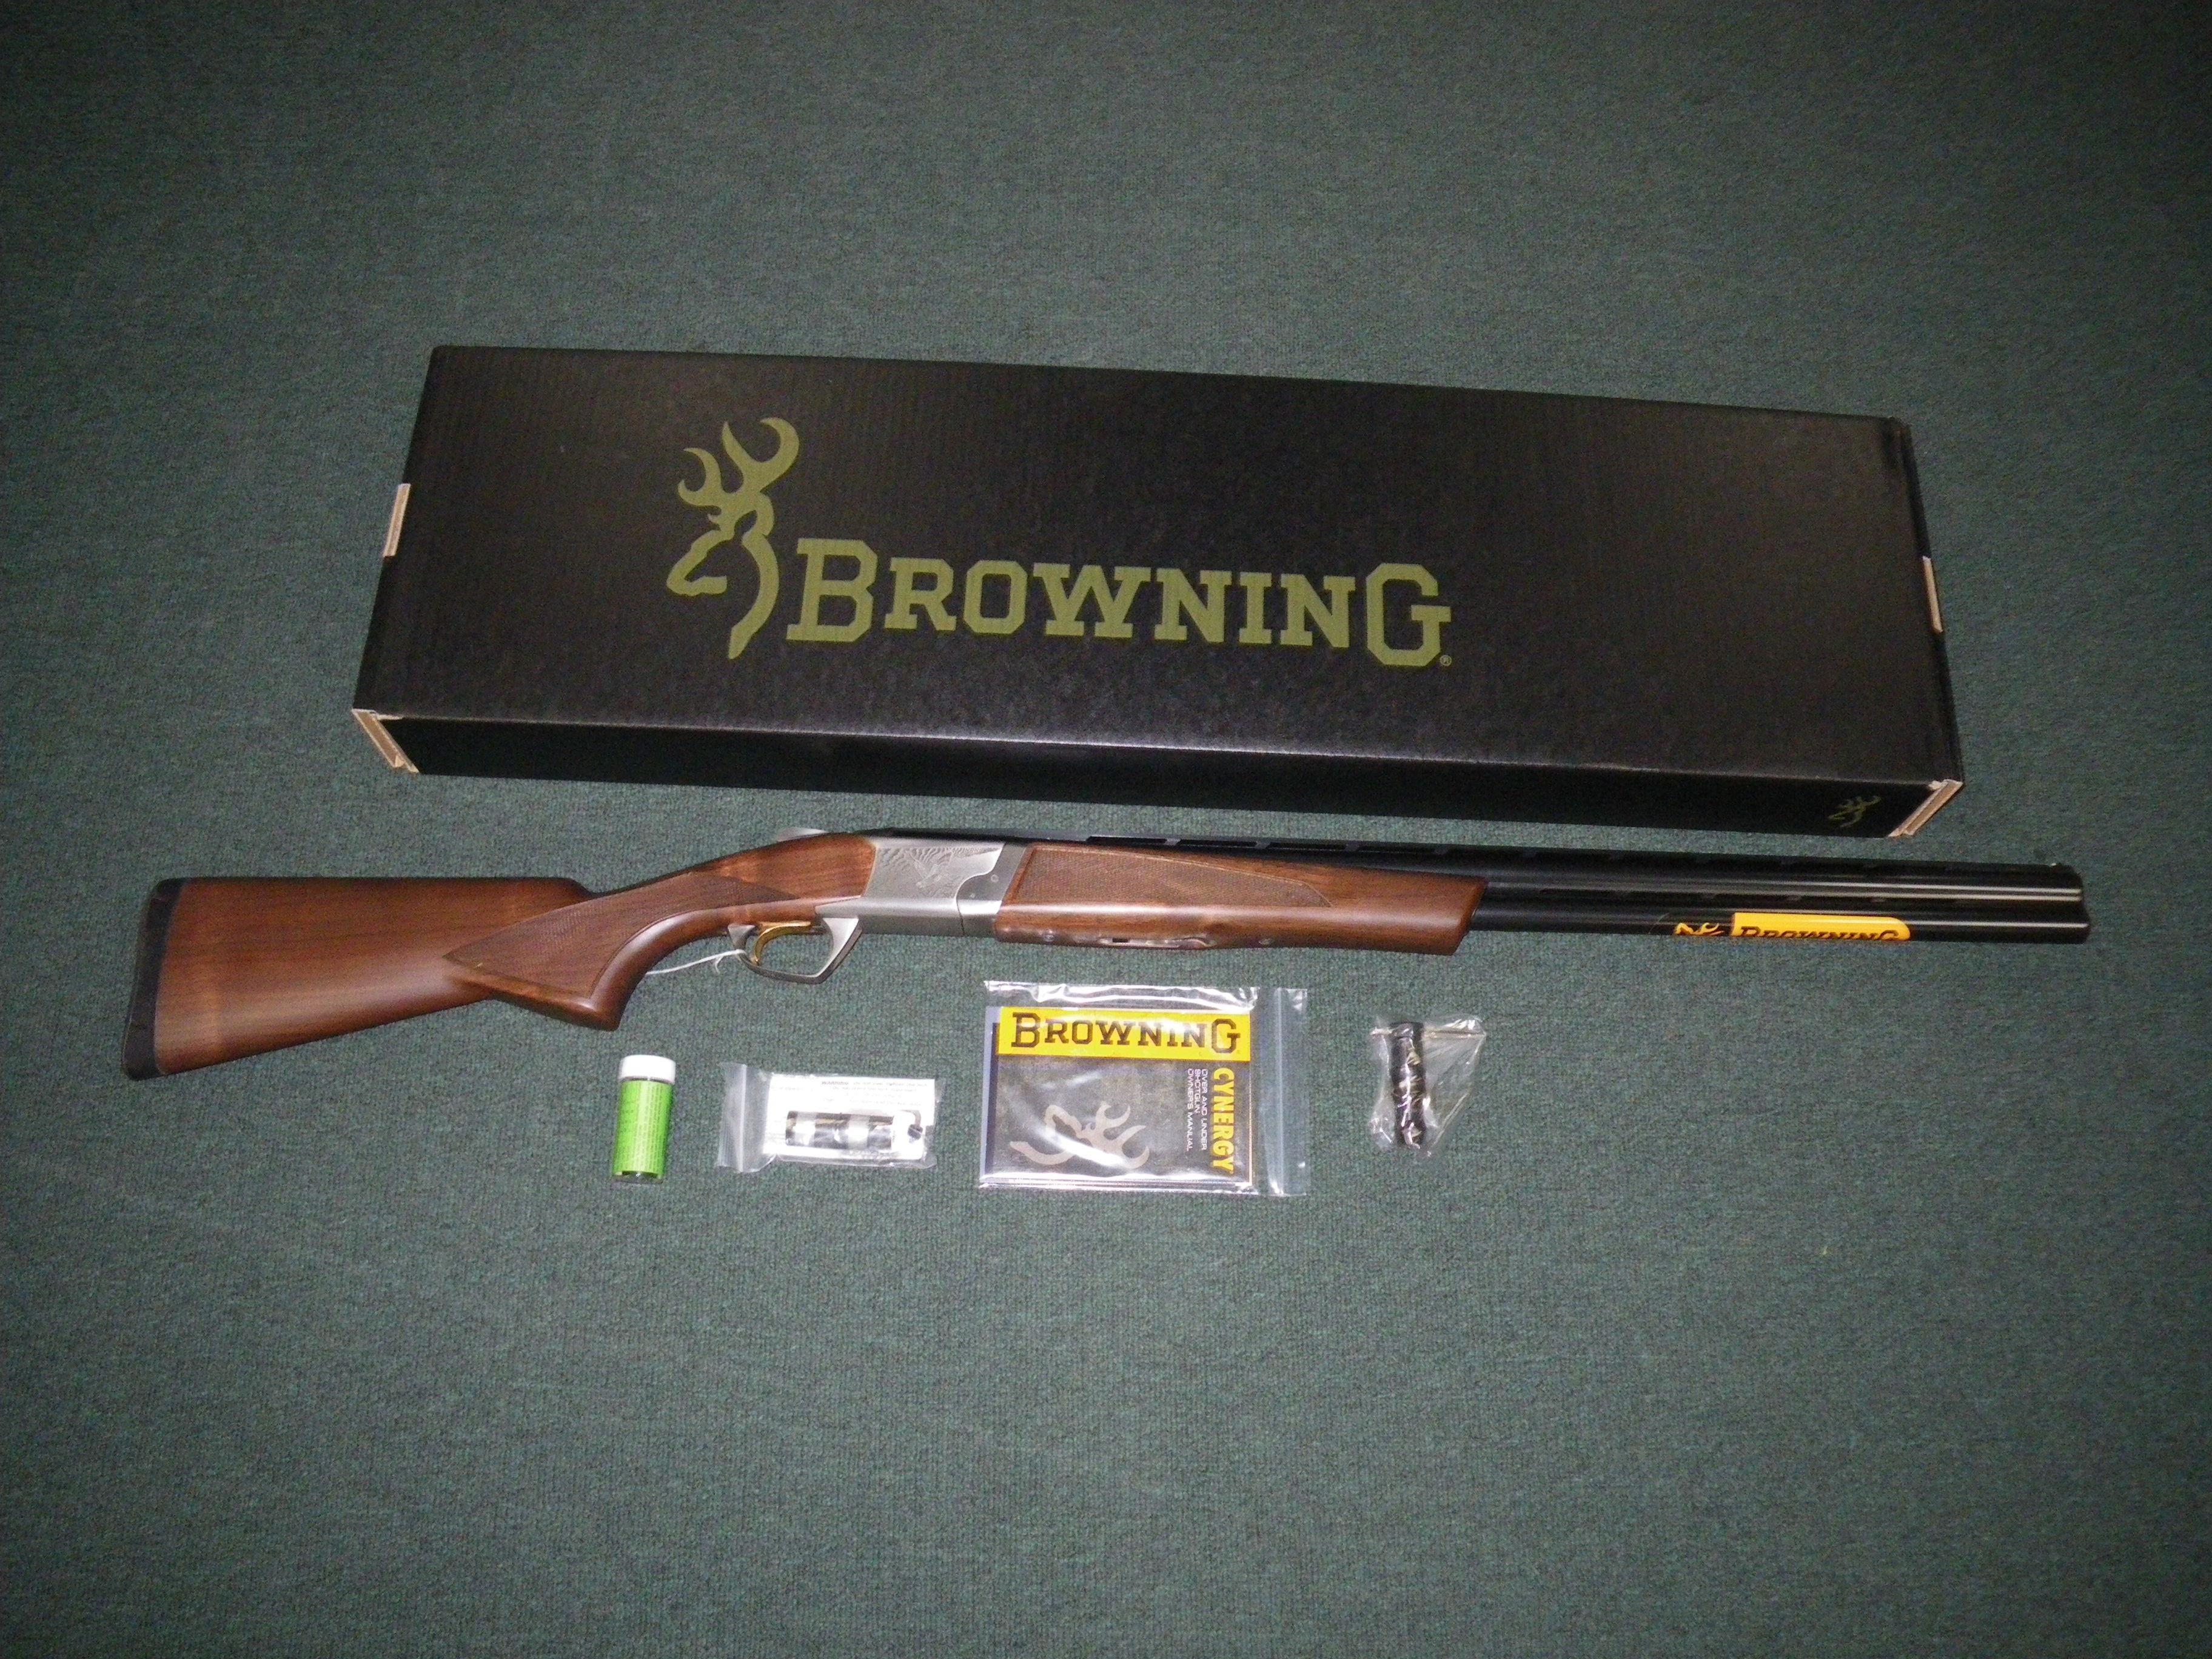 "Browning Cynergy Field 12ga 26"" 3"" Chamber NEW #018706305  Guns > Shotguns > Browning Shotguns > Over Unders > Cynergy > Hunting"